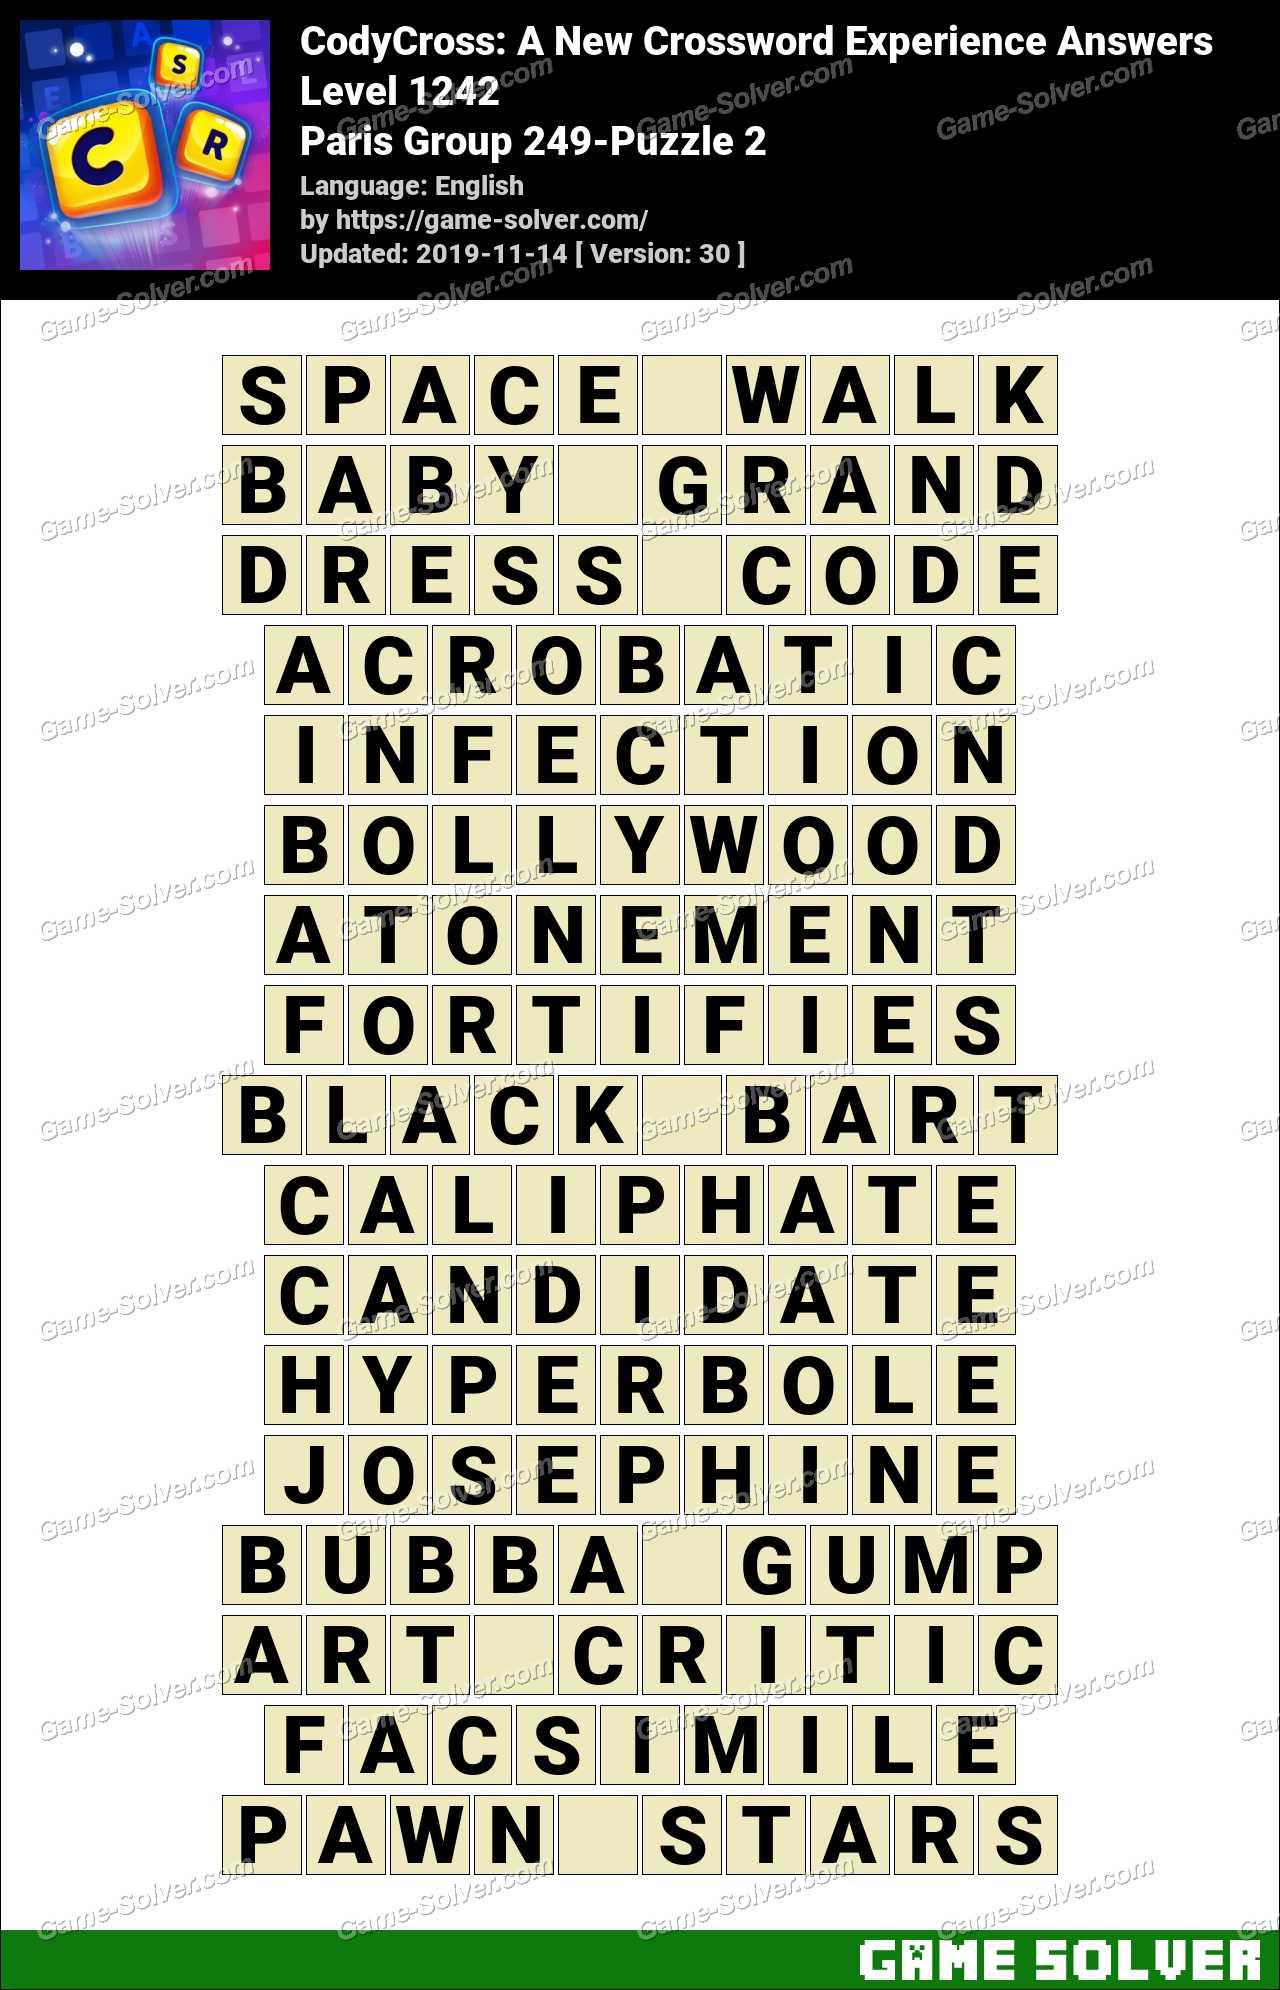 CodyCross Paris Group 249-Puzzle 2 Answers